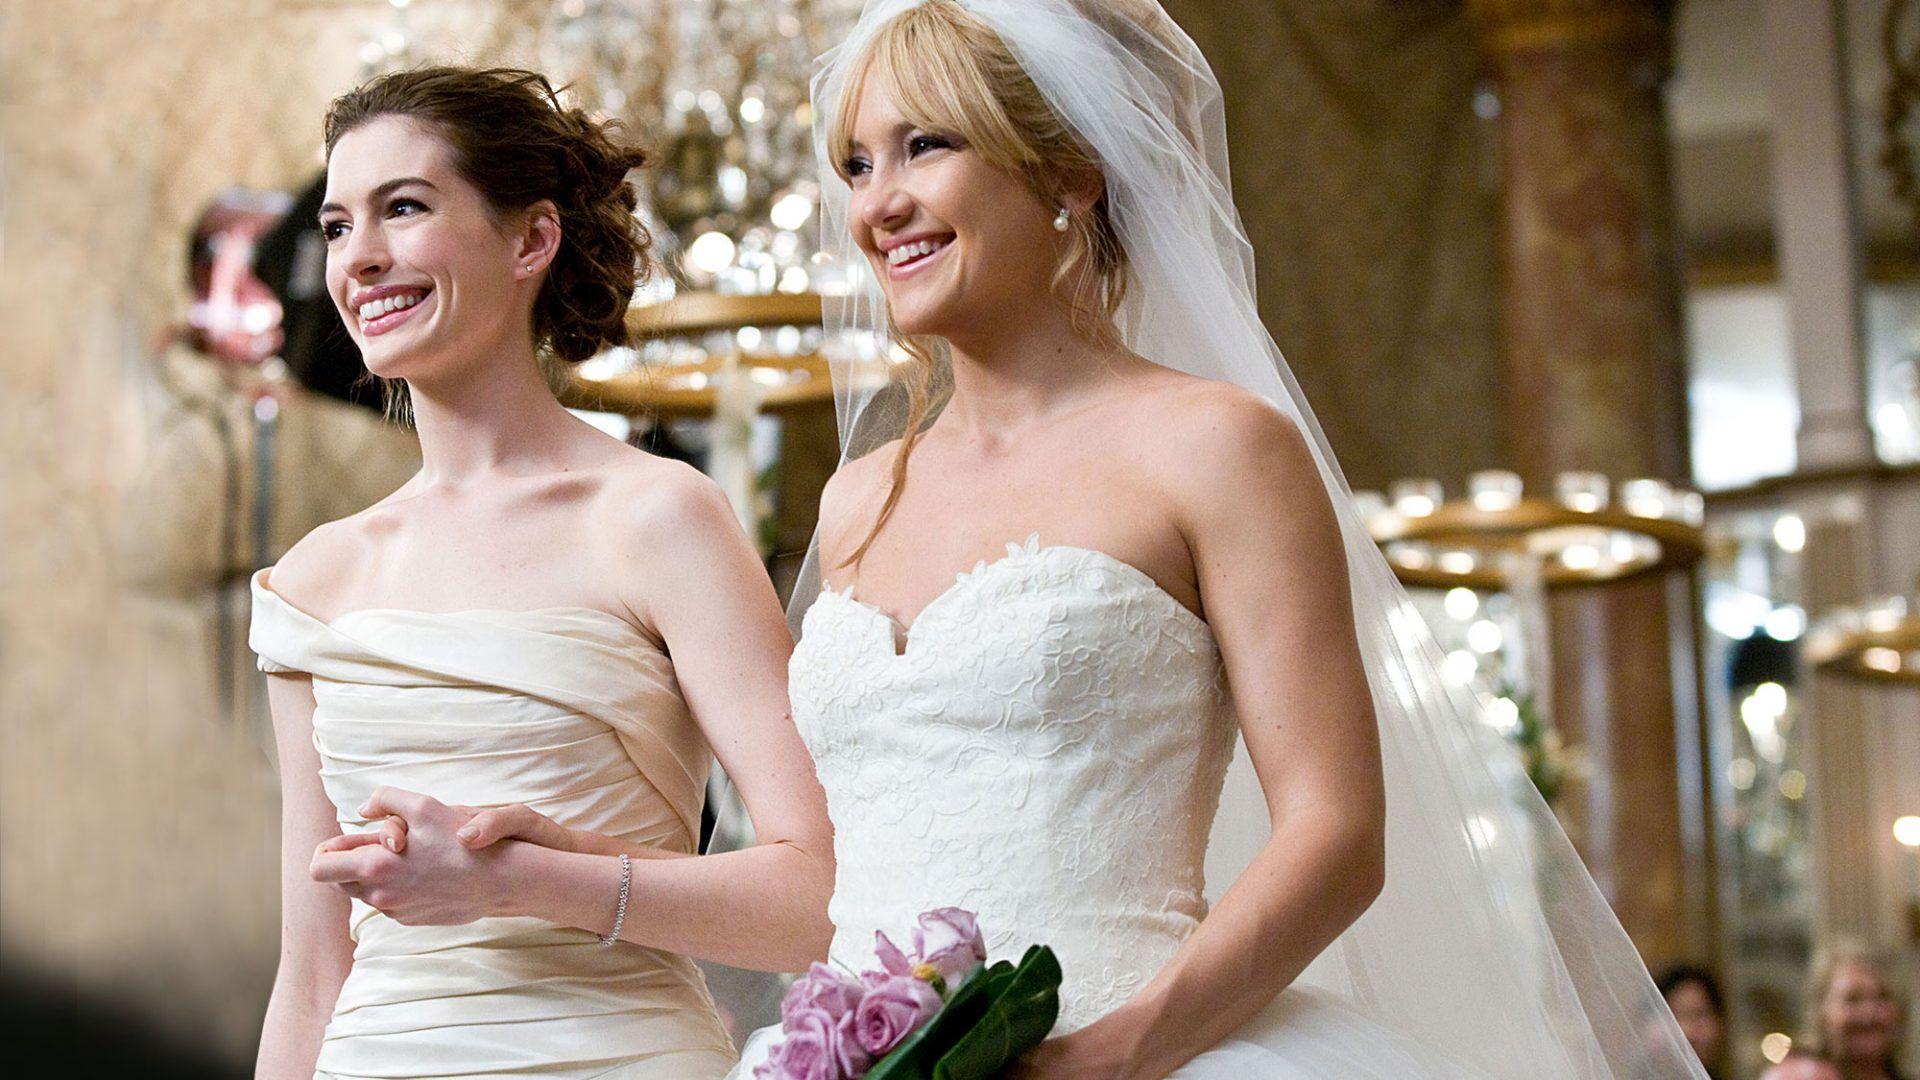 Bride Wars Movie Wedding Dresses Wedding Movies Bride Wars